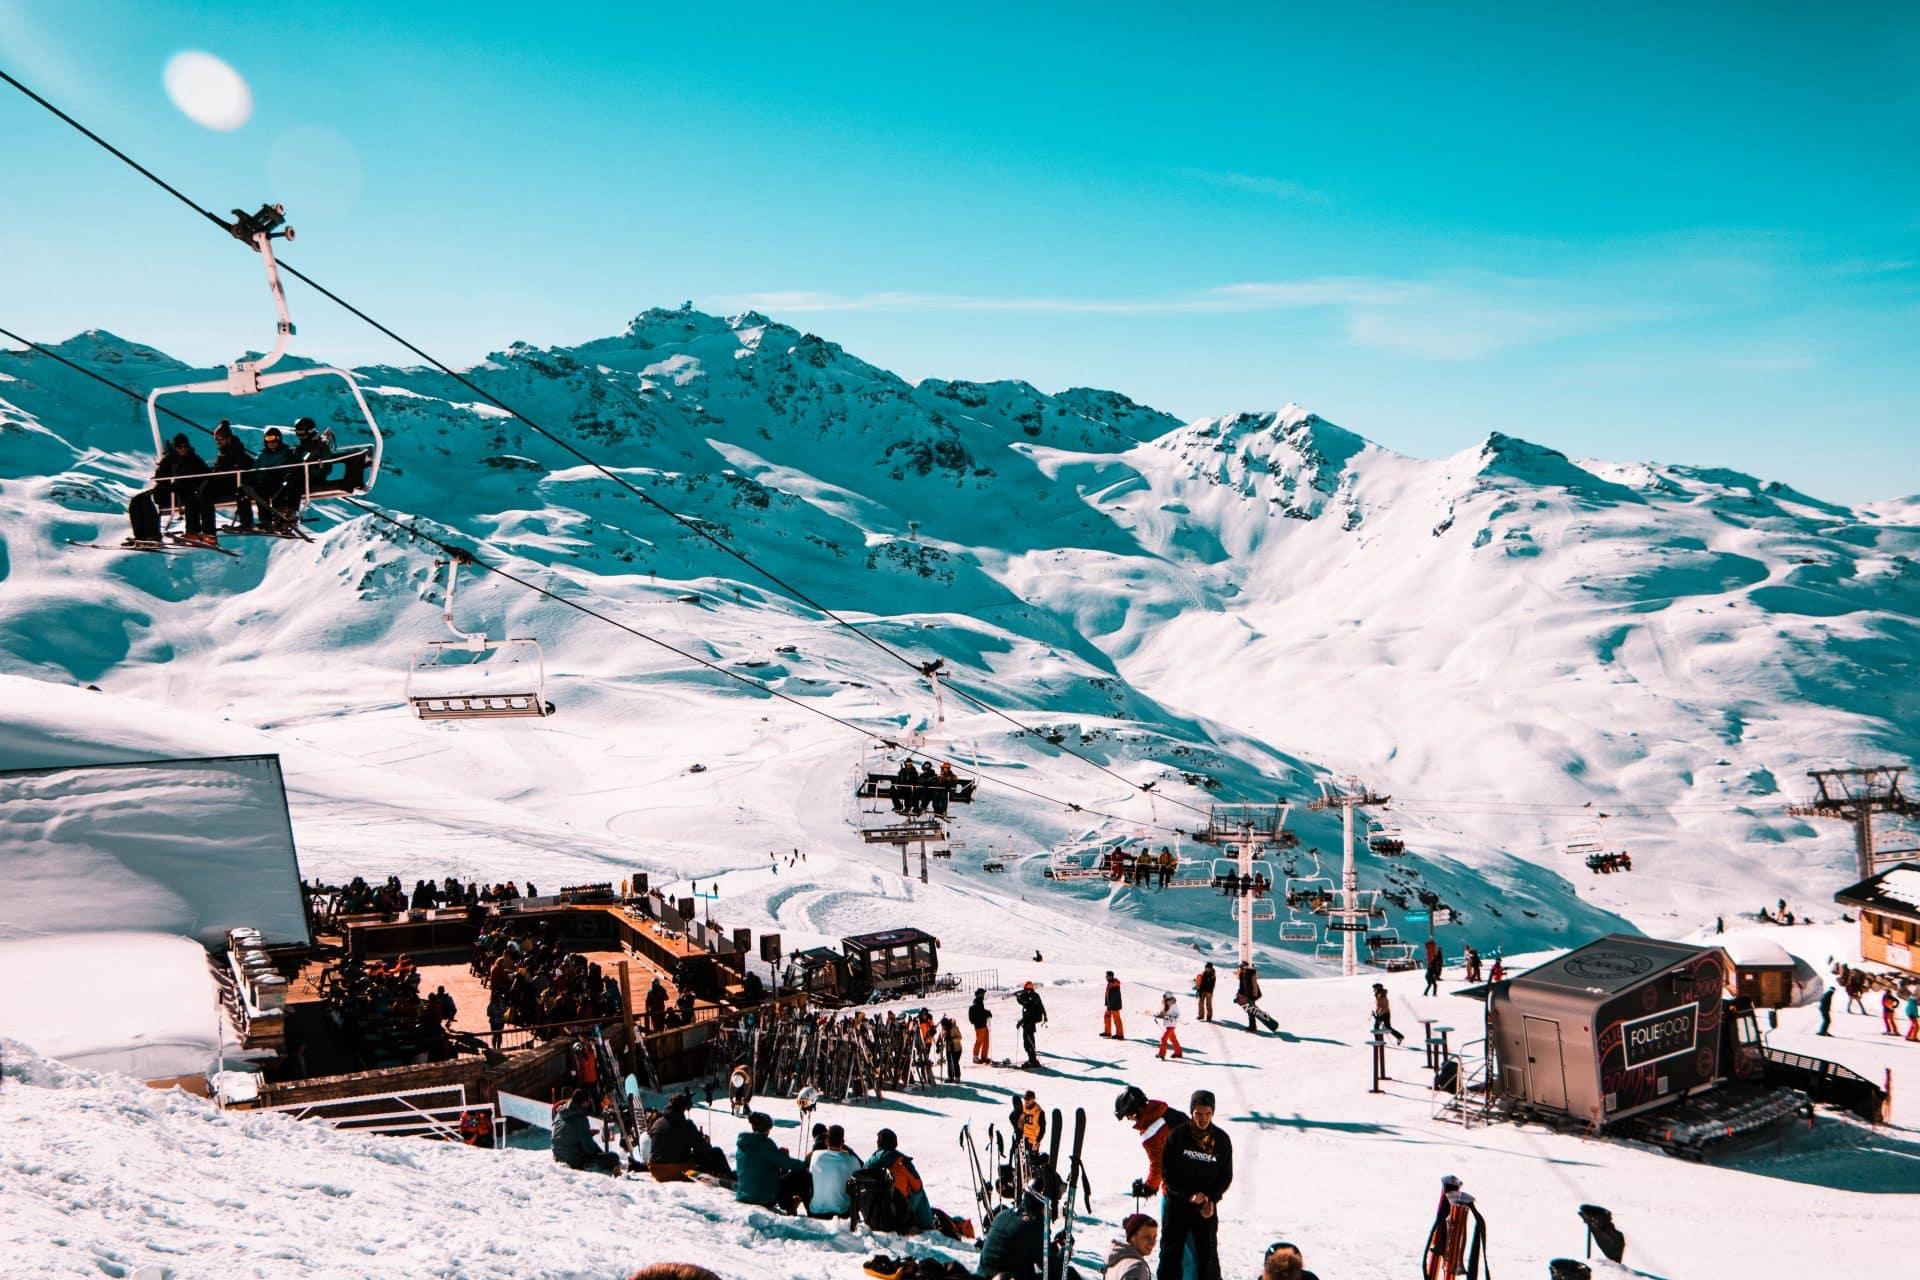 Best Ski Resorts In The French Alps